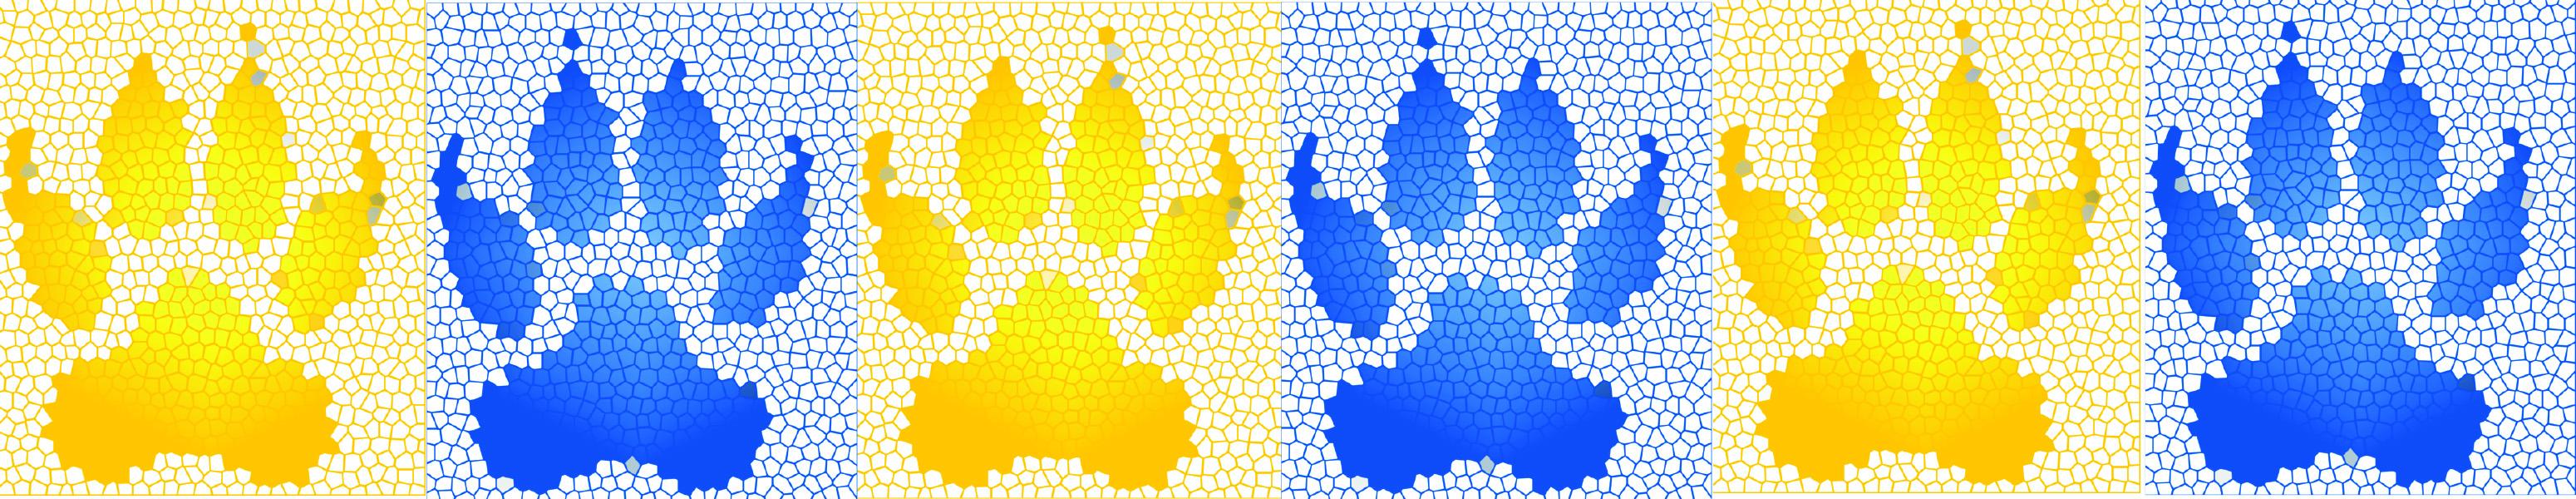 mosaic paw print